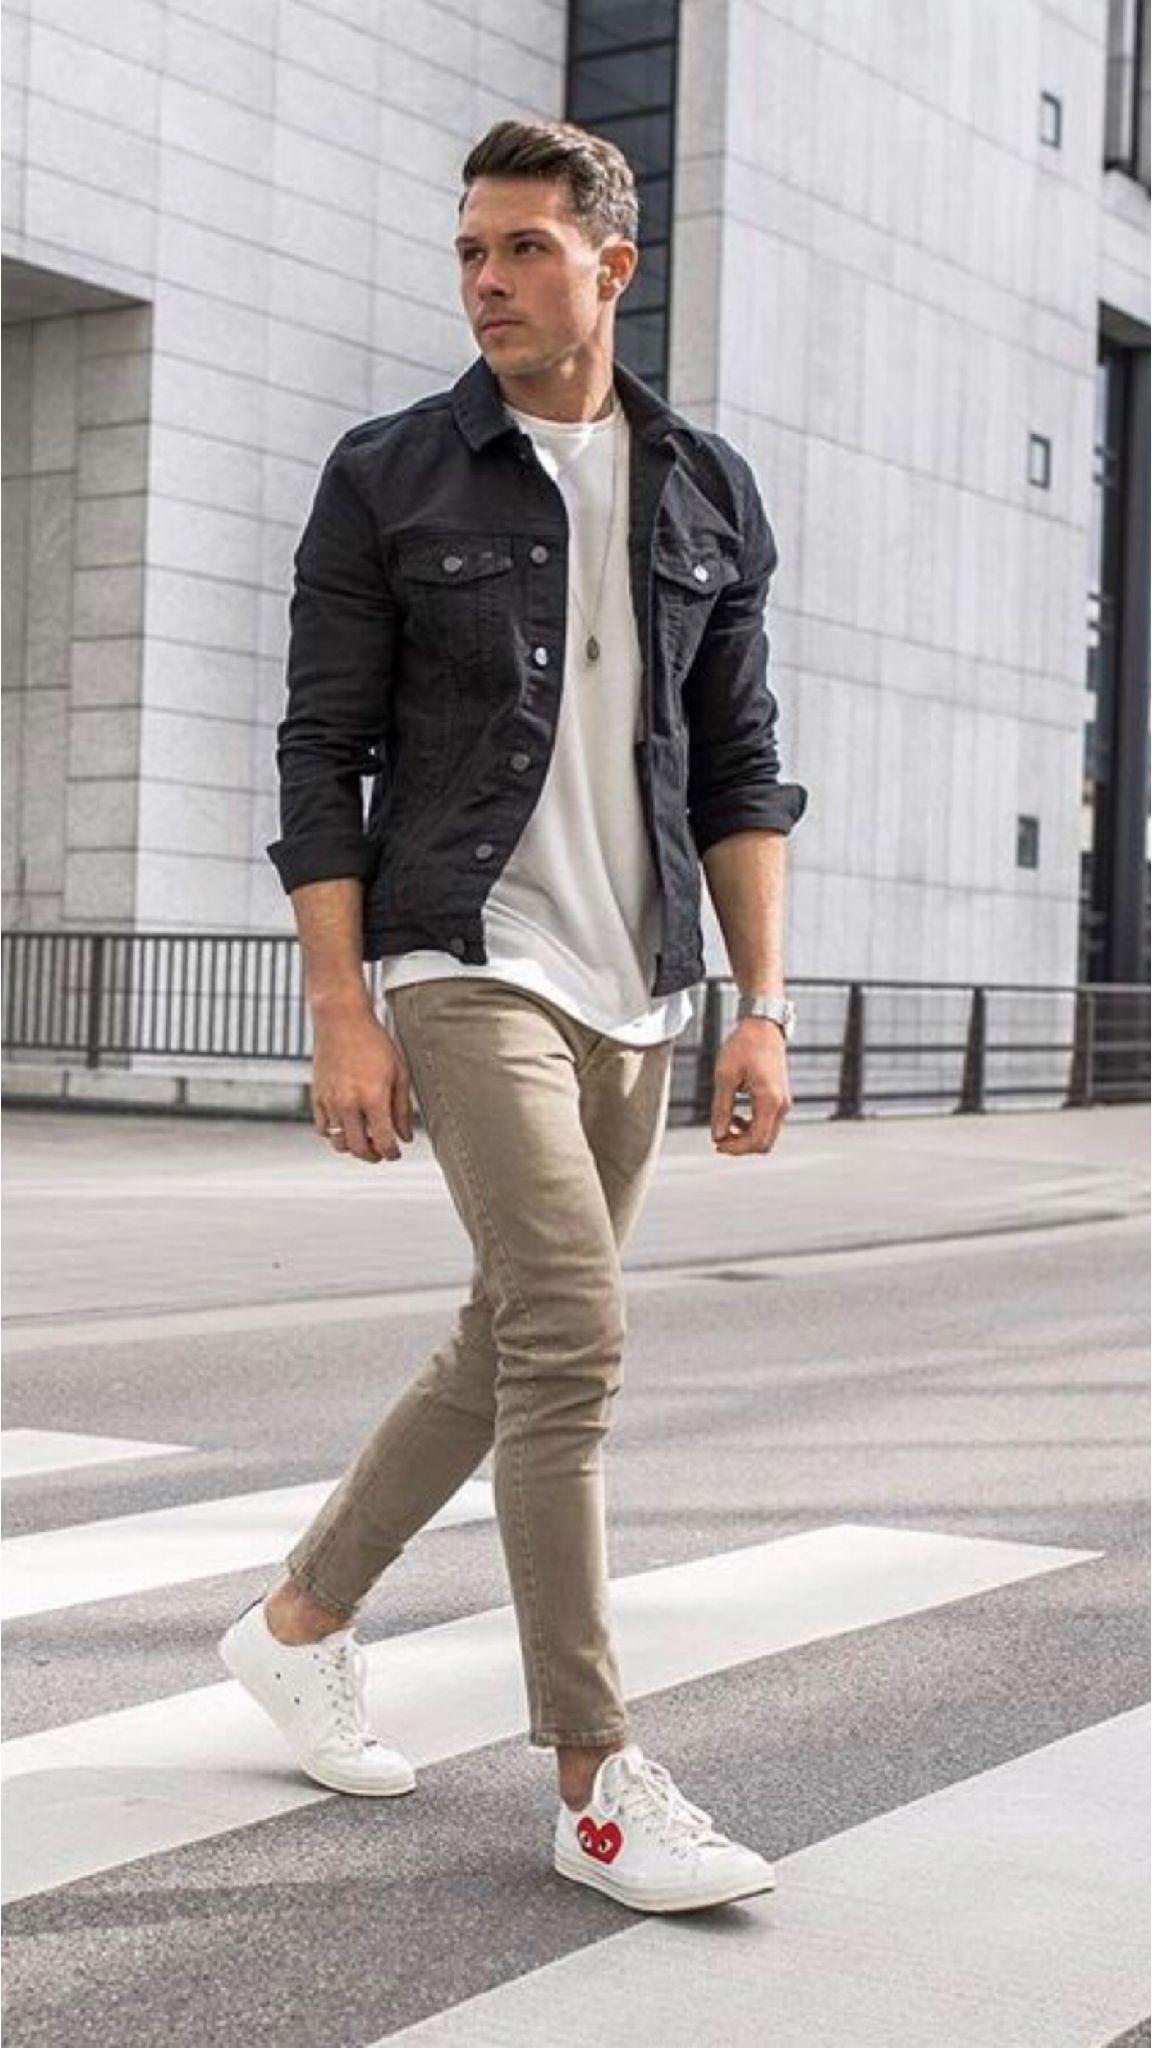 57 How To Wear School Outfit For Men Vialaven Com Habillement Homme Style Vestimentaire Homme Mode Mecs